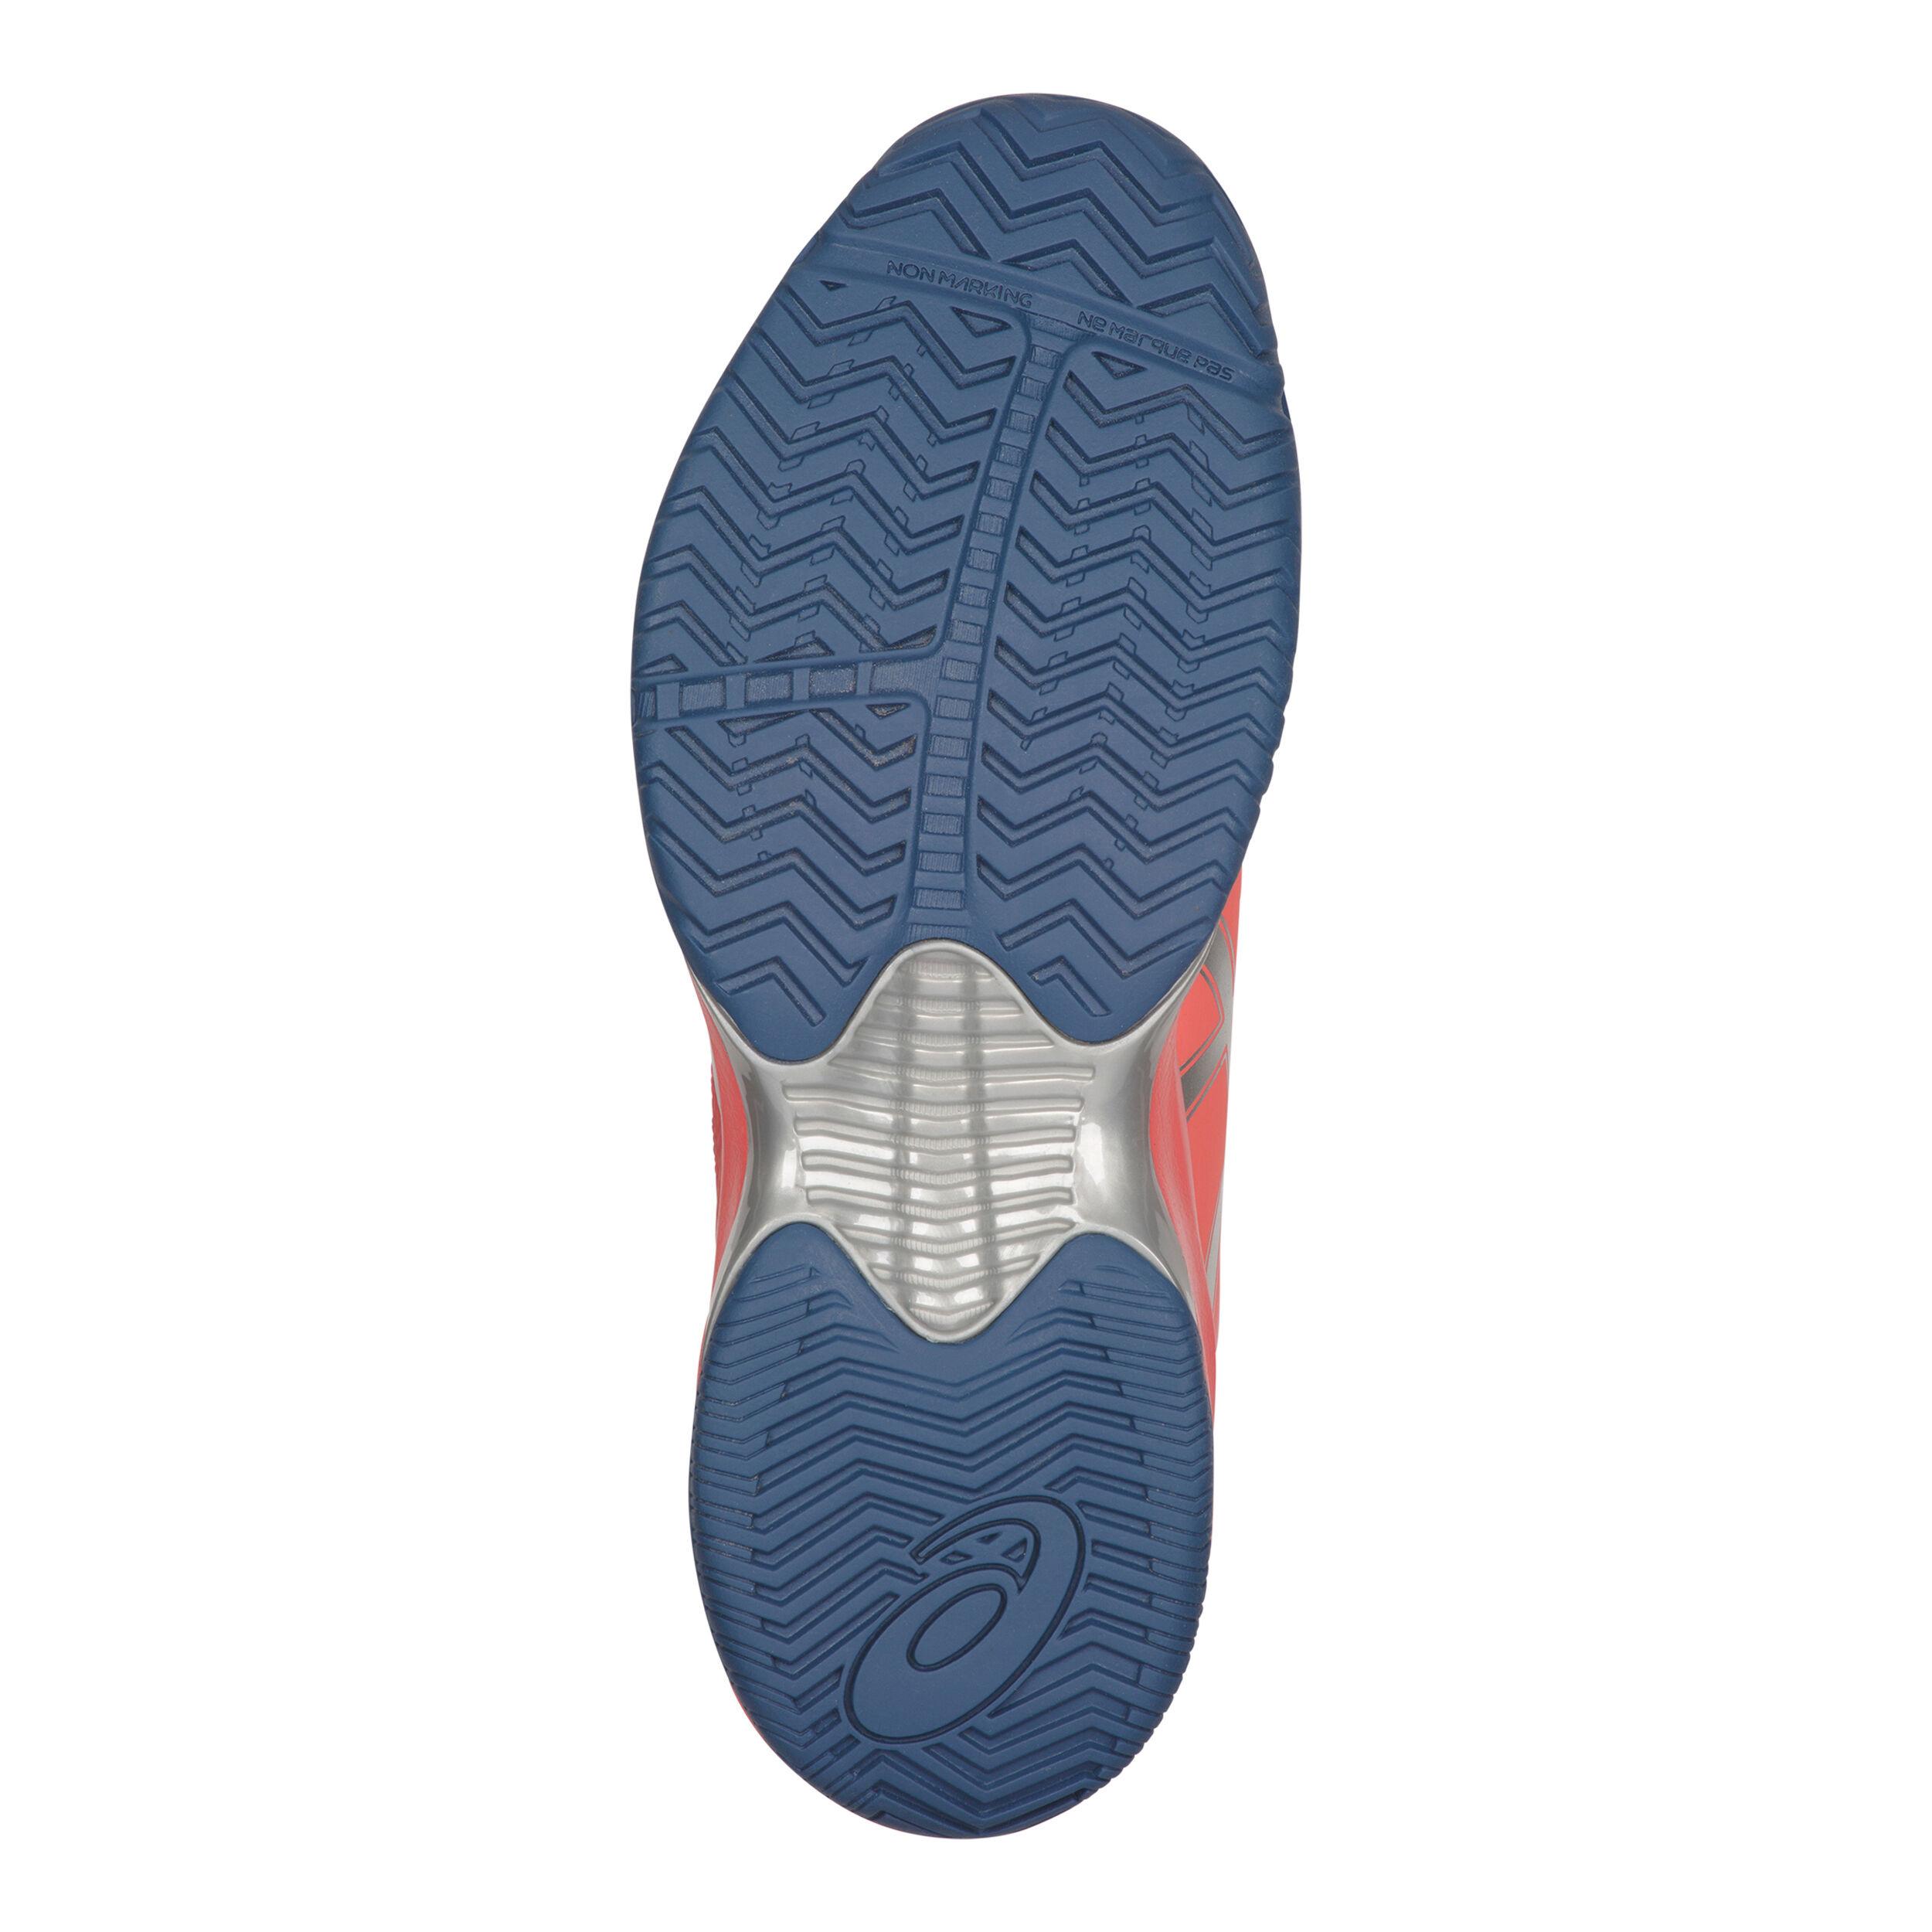 Asics Gel Court Speed Zapatilla Todas Las Superficies Mujeres Coral, Azul Oscuro